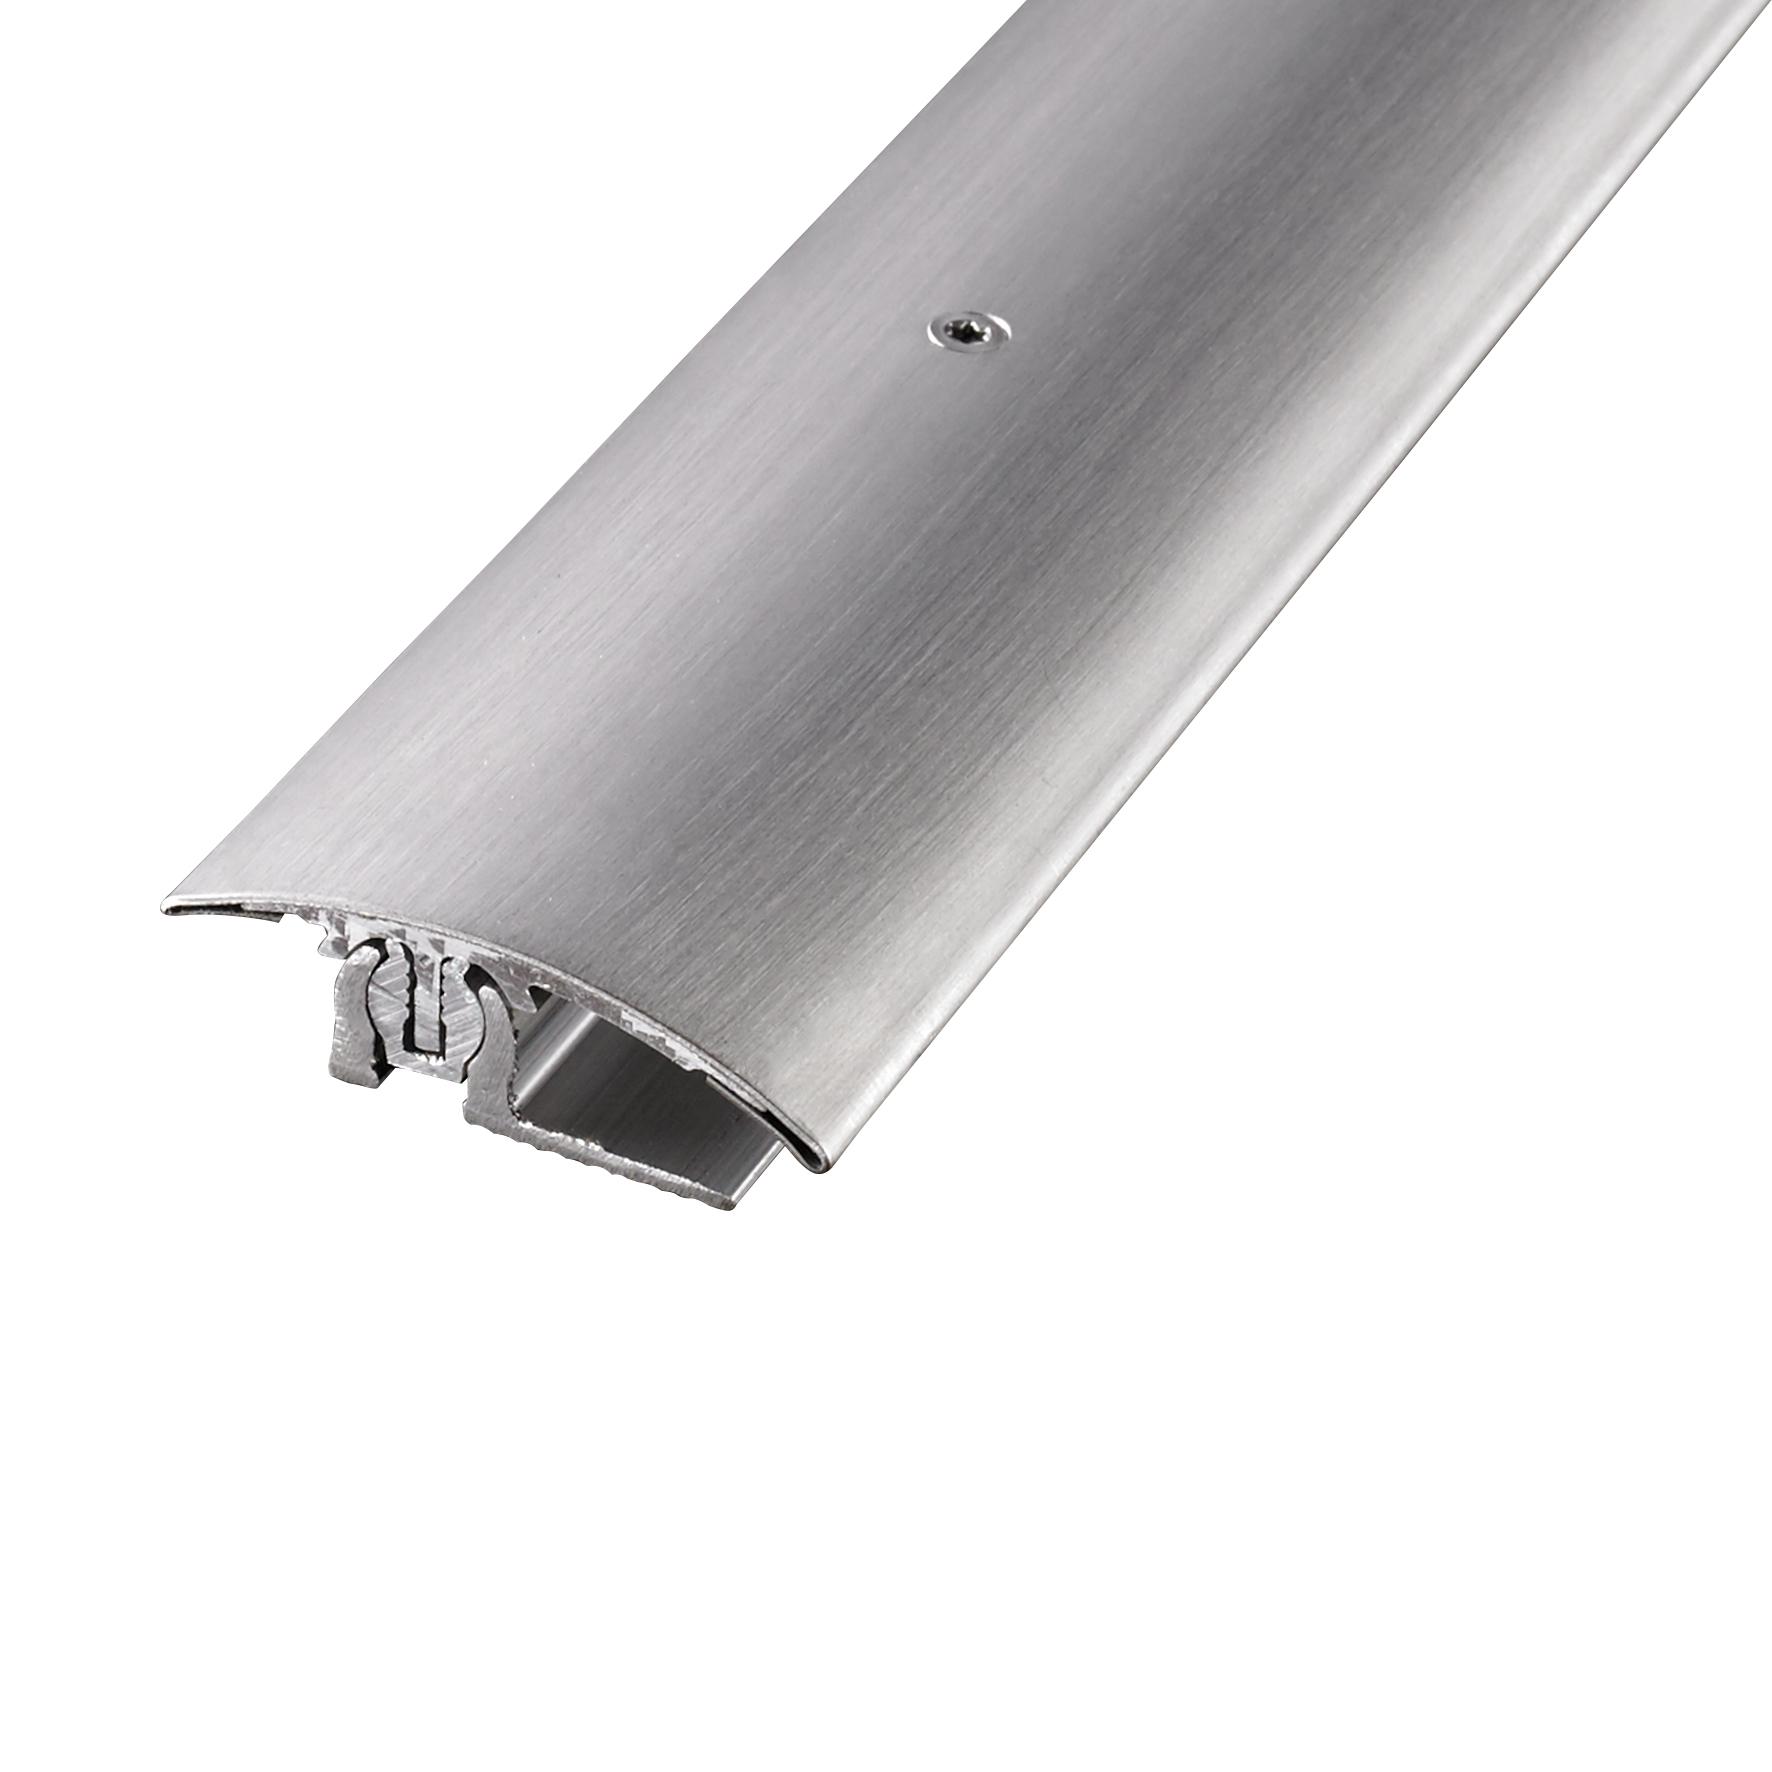 PROVARIO Uni stainless steel V2A